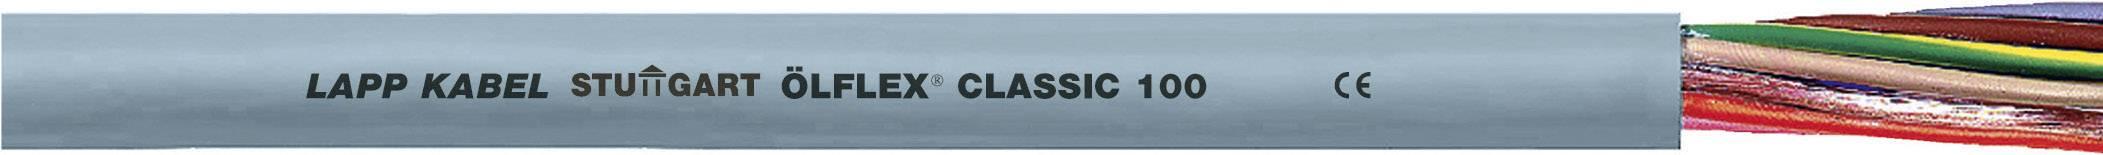 Kabel LappKabel Ölflex CLASSIC 100 3G1 (00100424), PVC, 6 mm, 750 V, šedá, 500 m